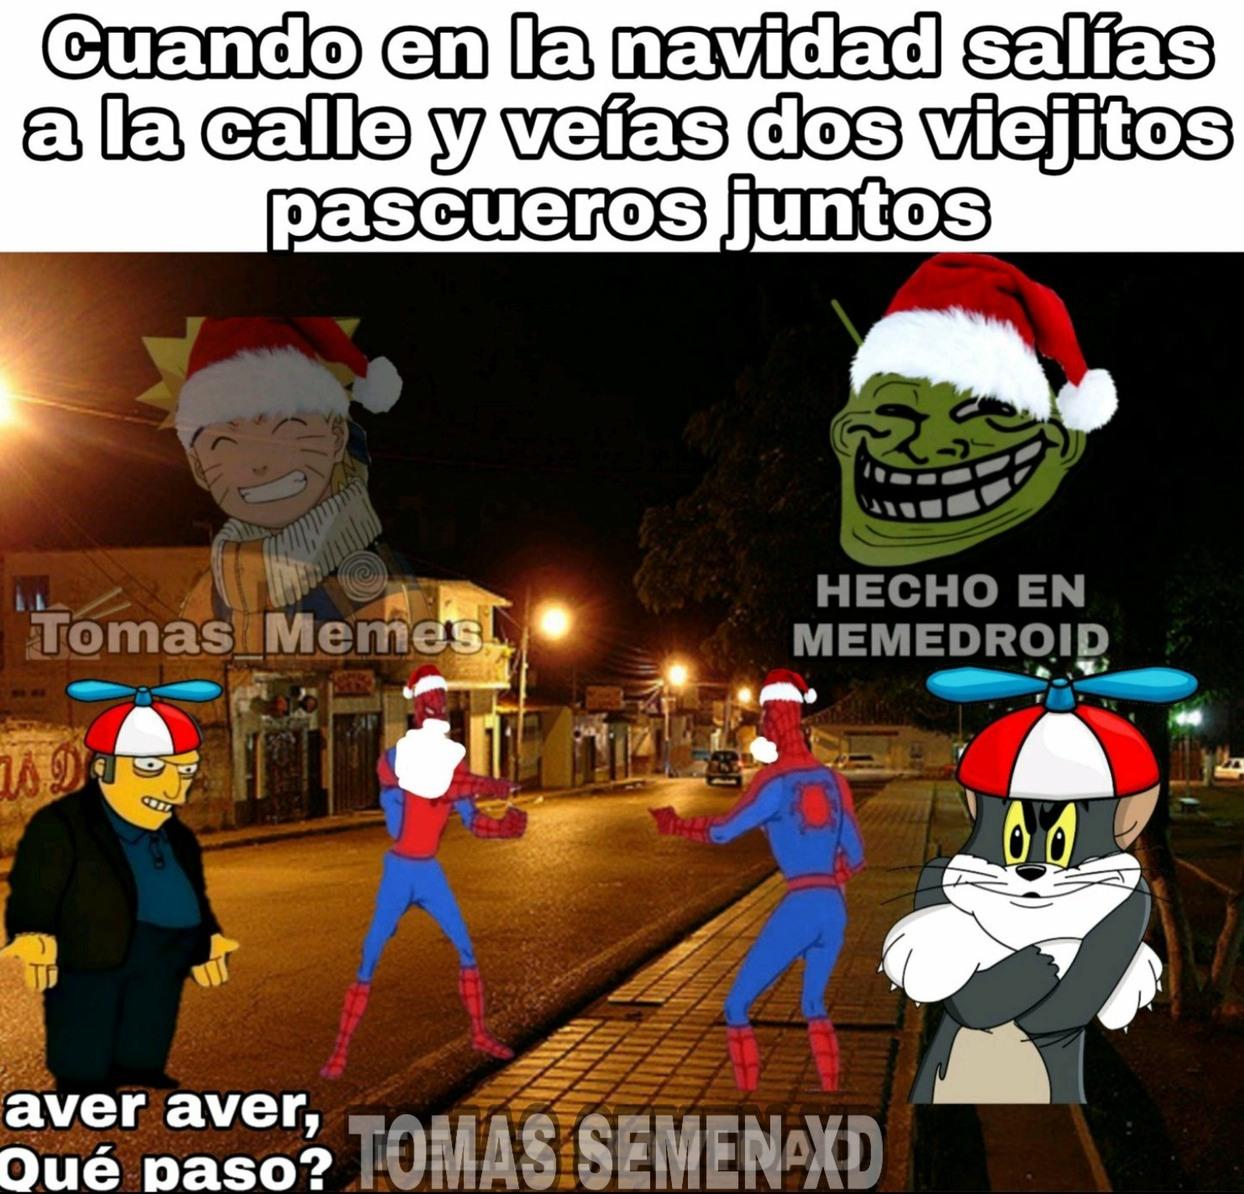 TOMAS SEMEN XDDDDDD - meme